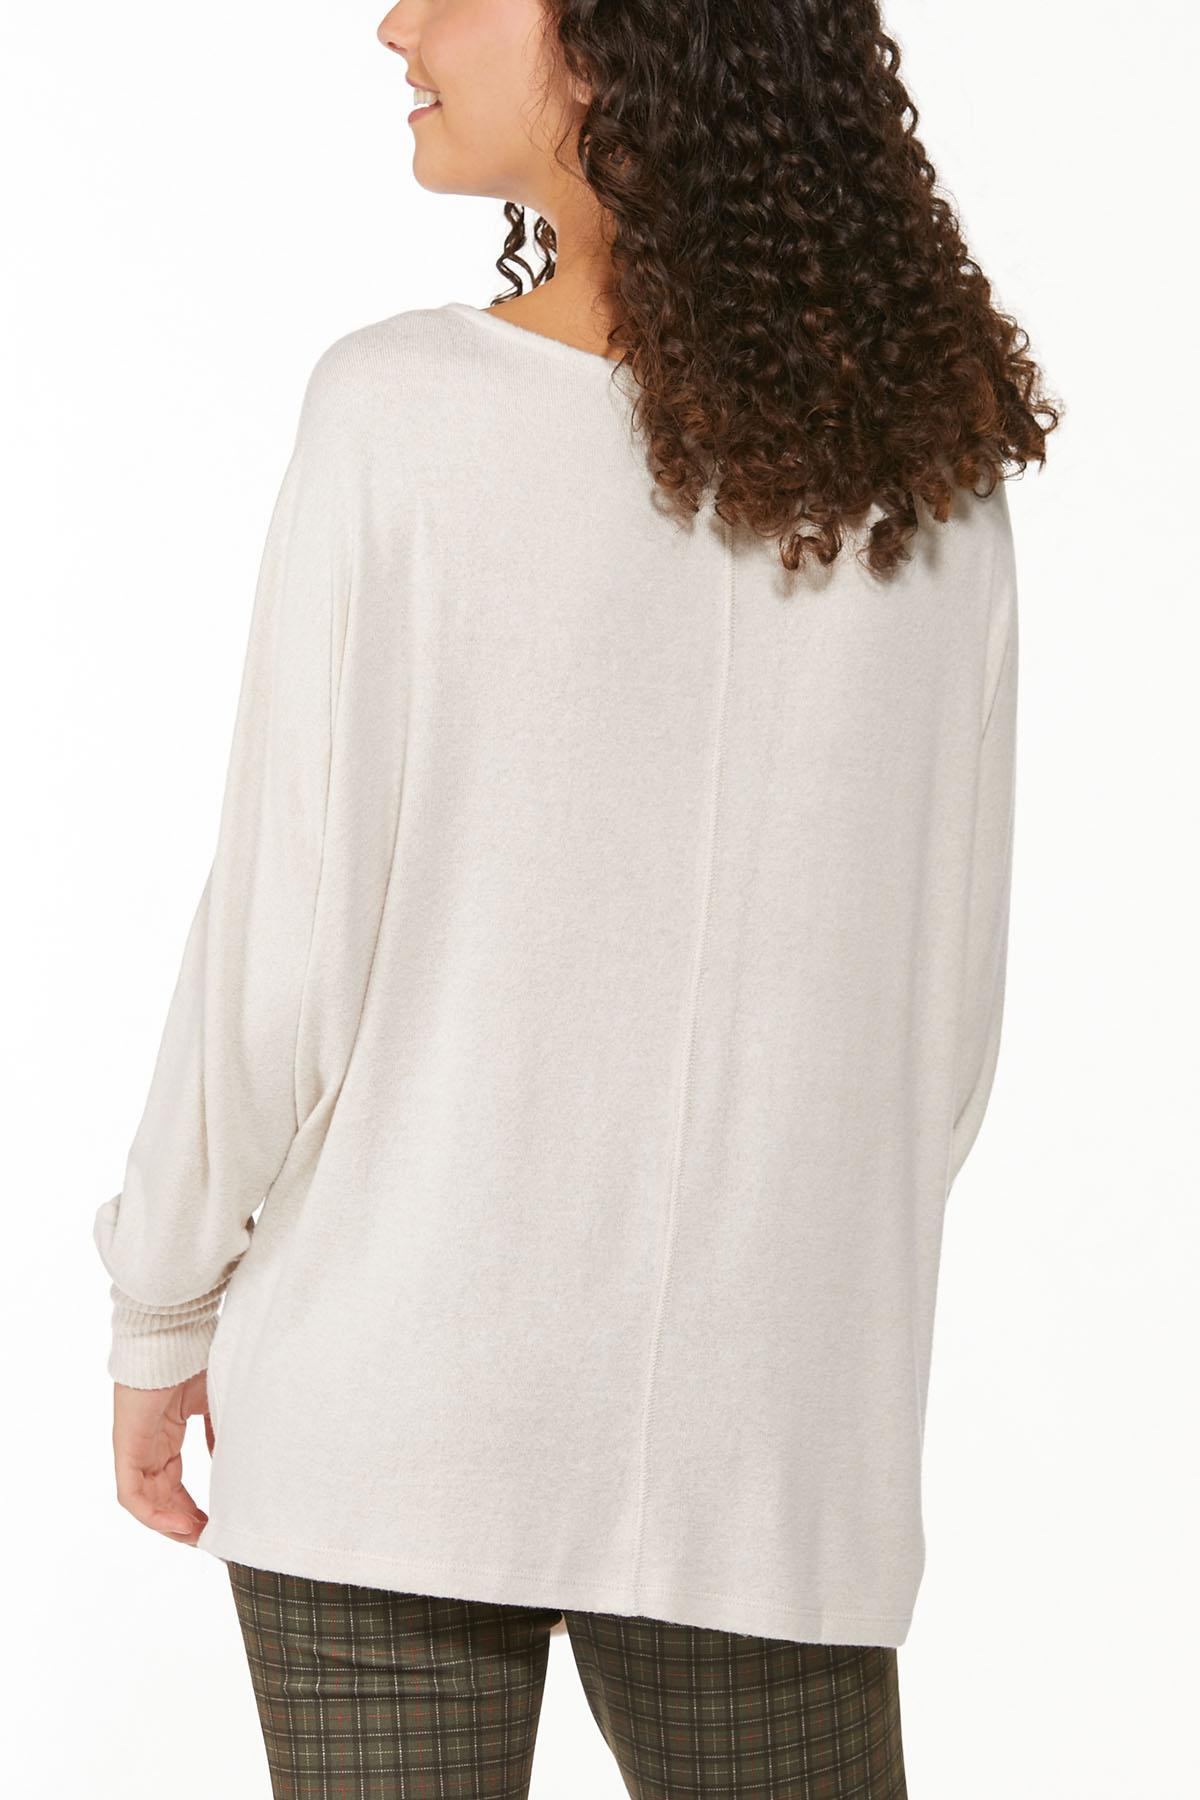 Plus Size Warm Oatmeal Sweater (Item #44790406)